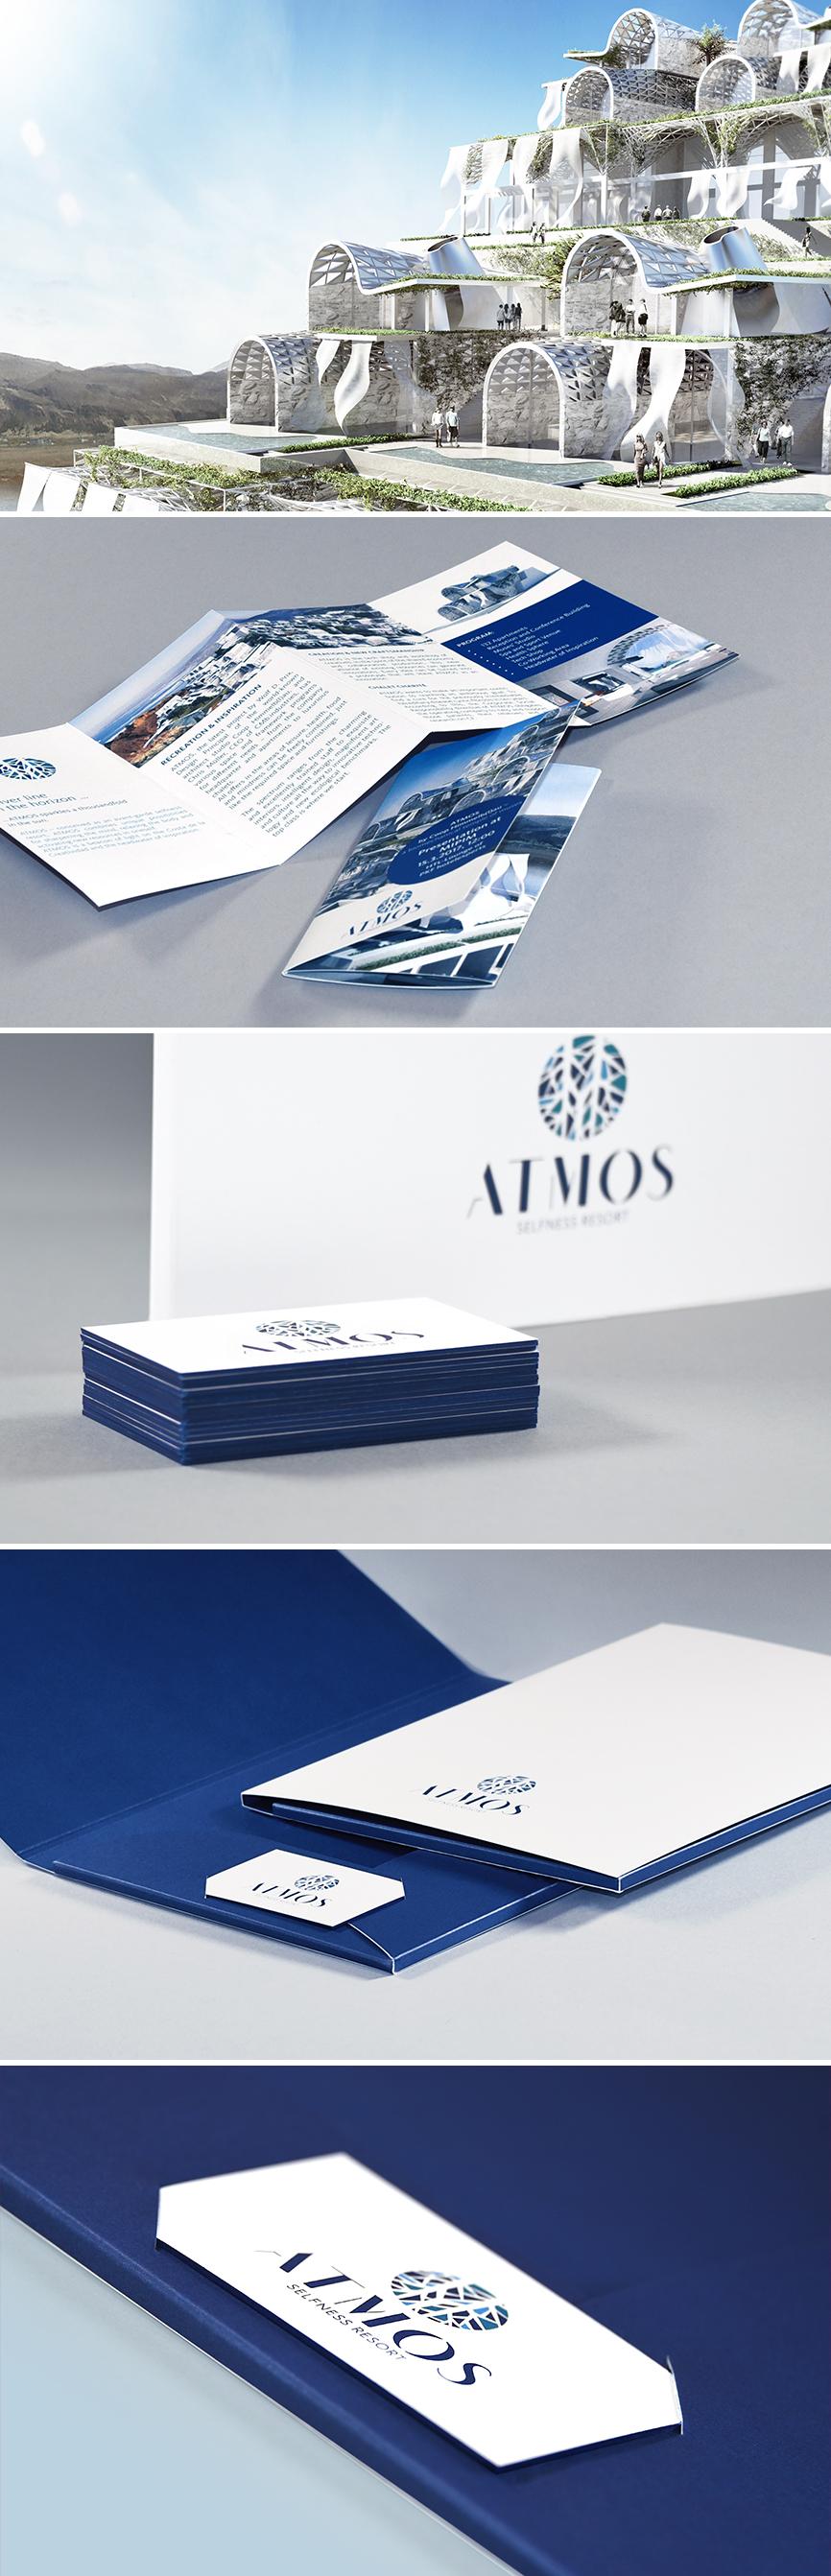 Atmos Corporate Design Www Lunik2 Com Marketing Werbeagentur Marketing Services